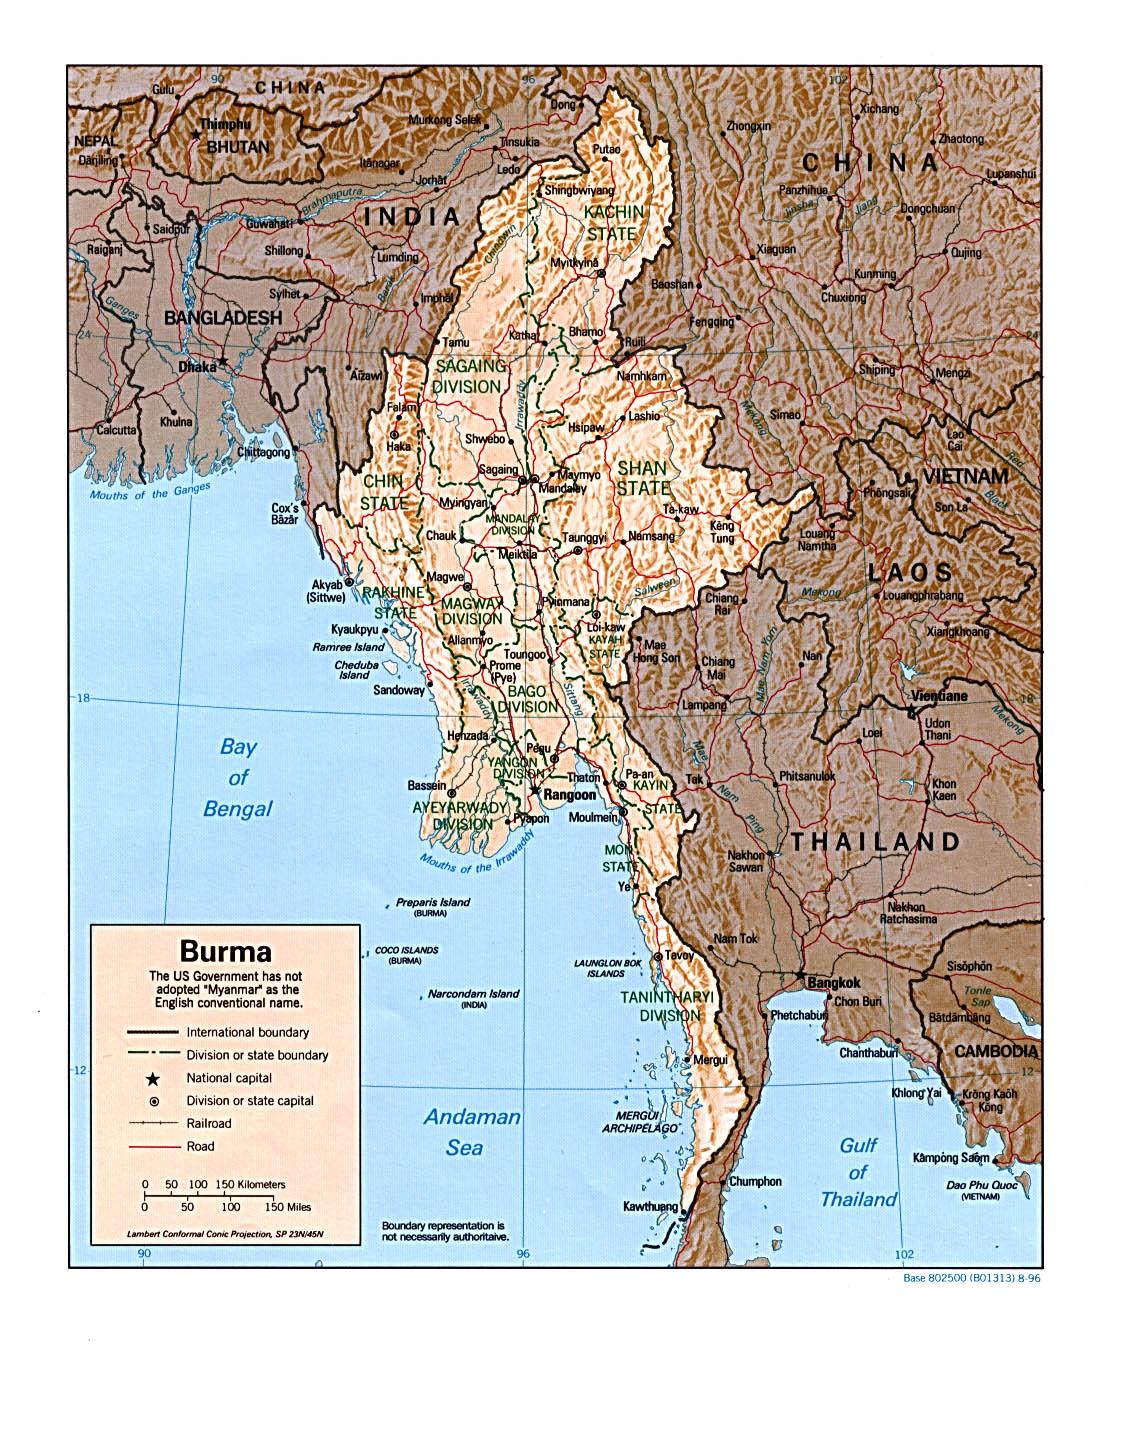 5 free maps of Myanmar - ASEAN UP